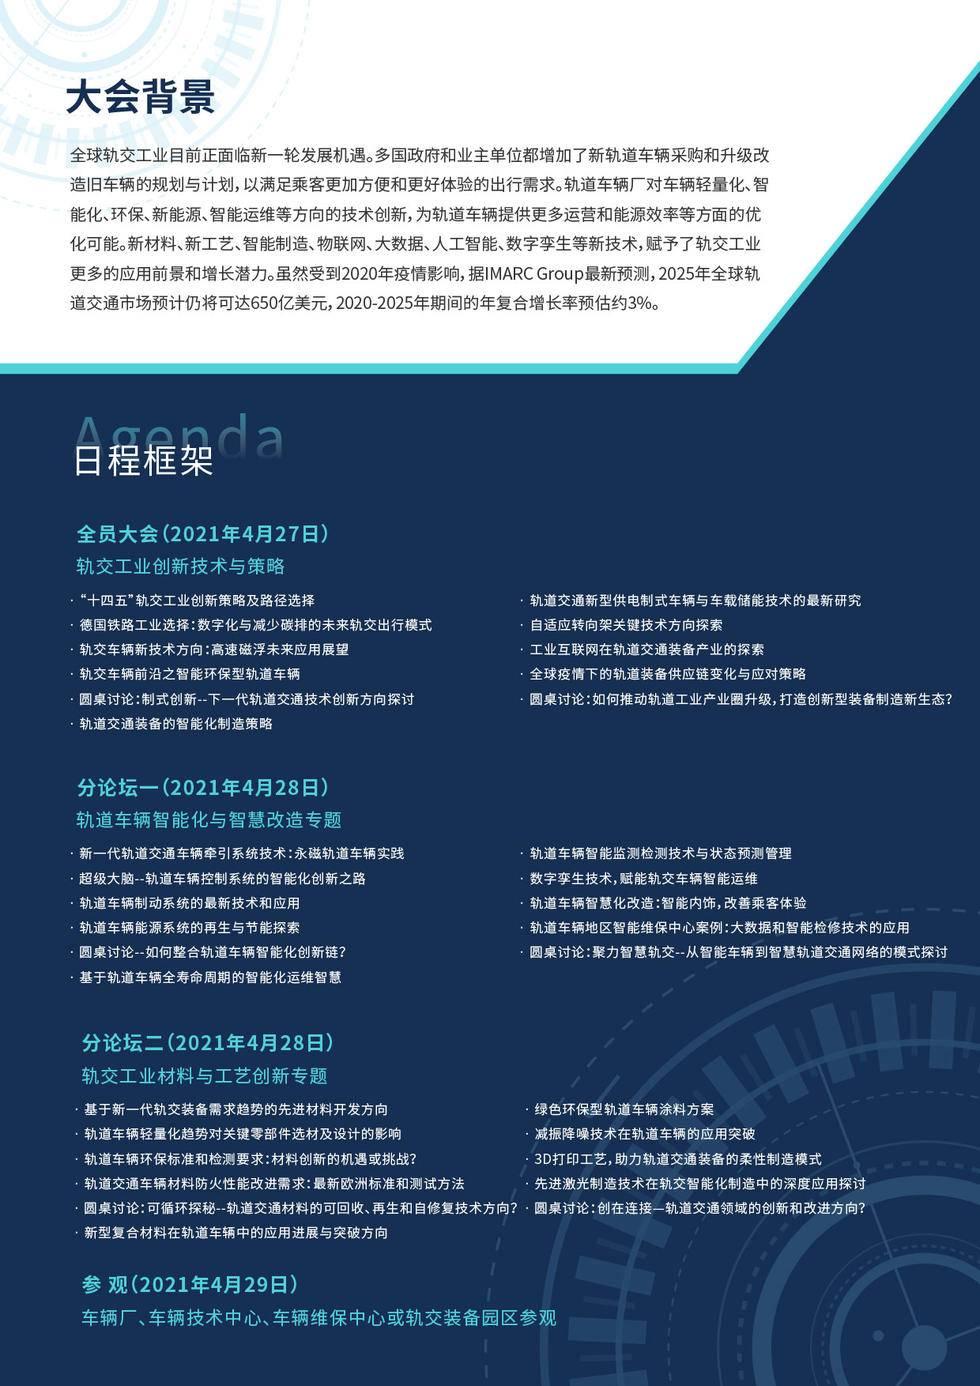 brochure-1.19_画板 1 副本.jpg